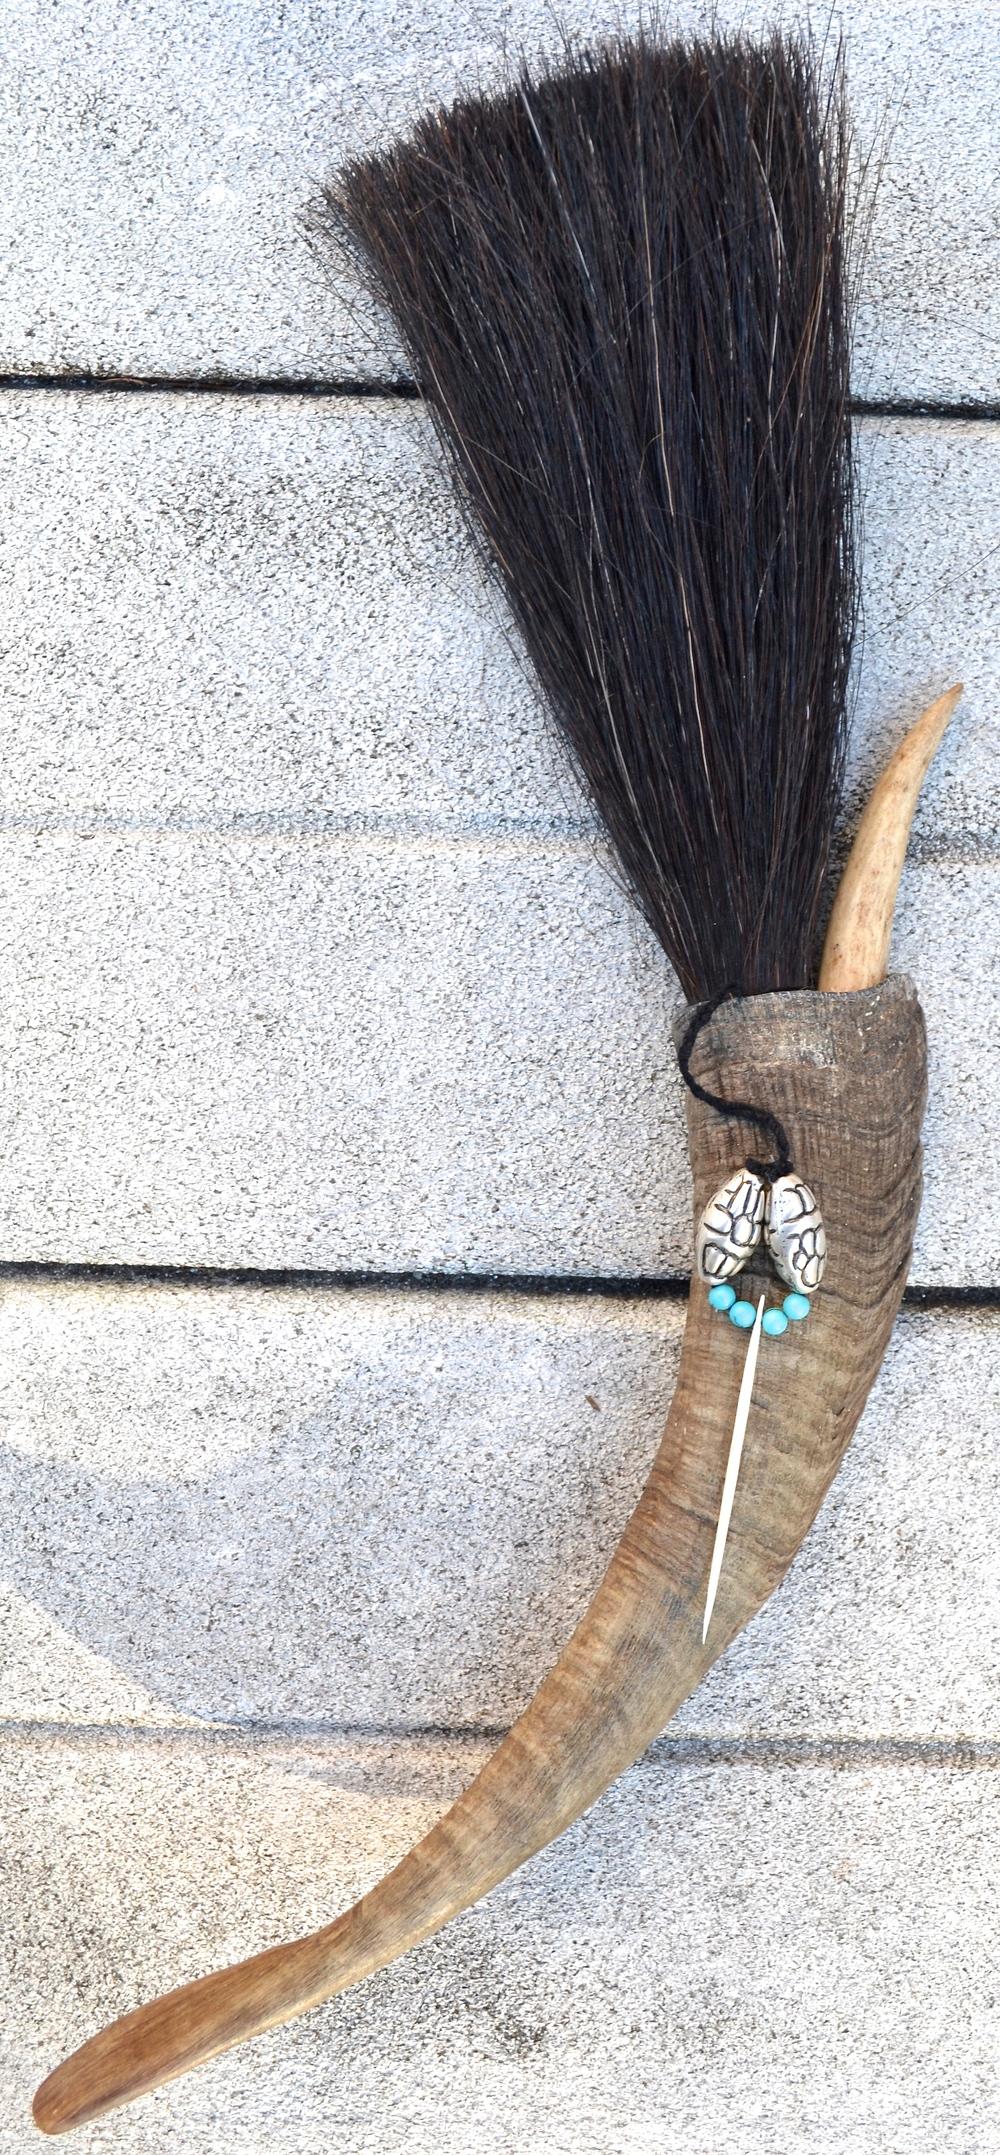 Goat horn, horse hair, deer antler tip, twine, stingray barb, turquoiseand metal beads